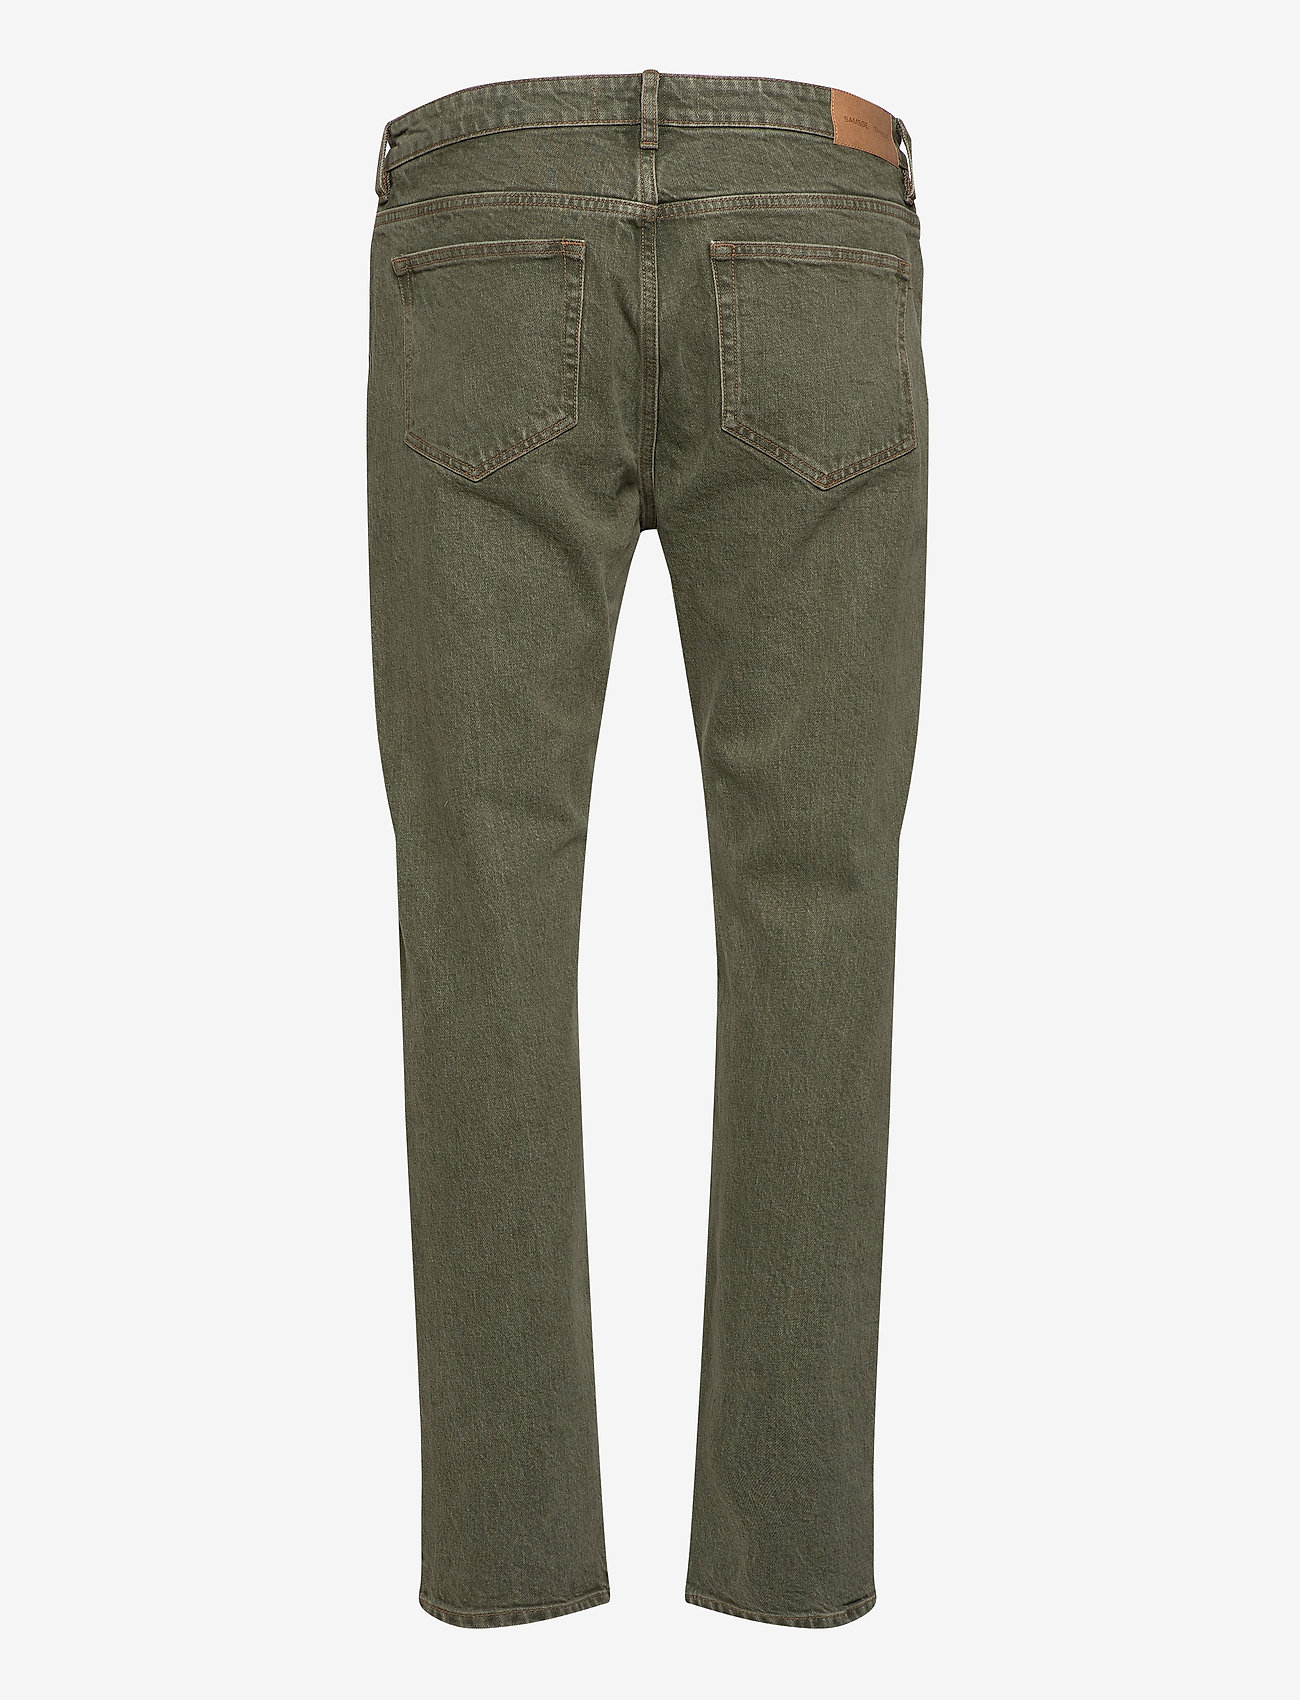 Samsøe Samsøe - Rory jeans 12717 - regular jeans - grass - 1